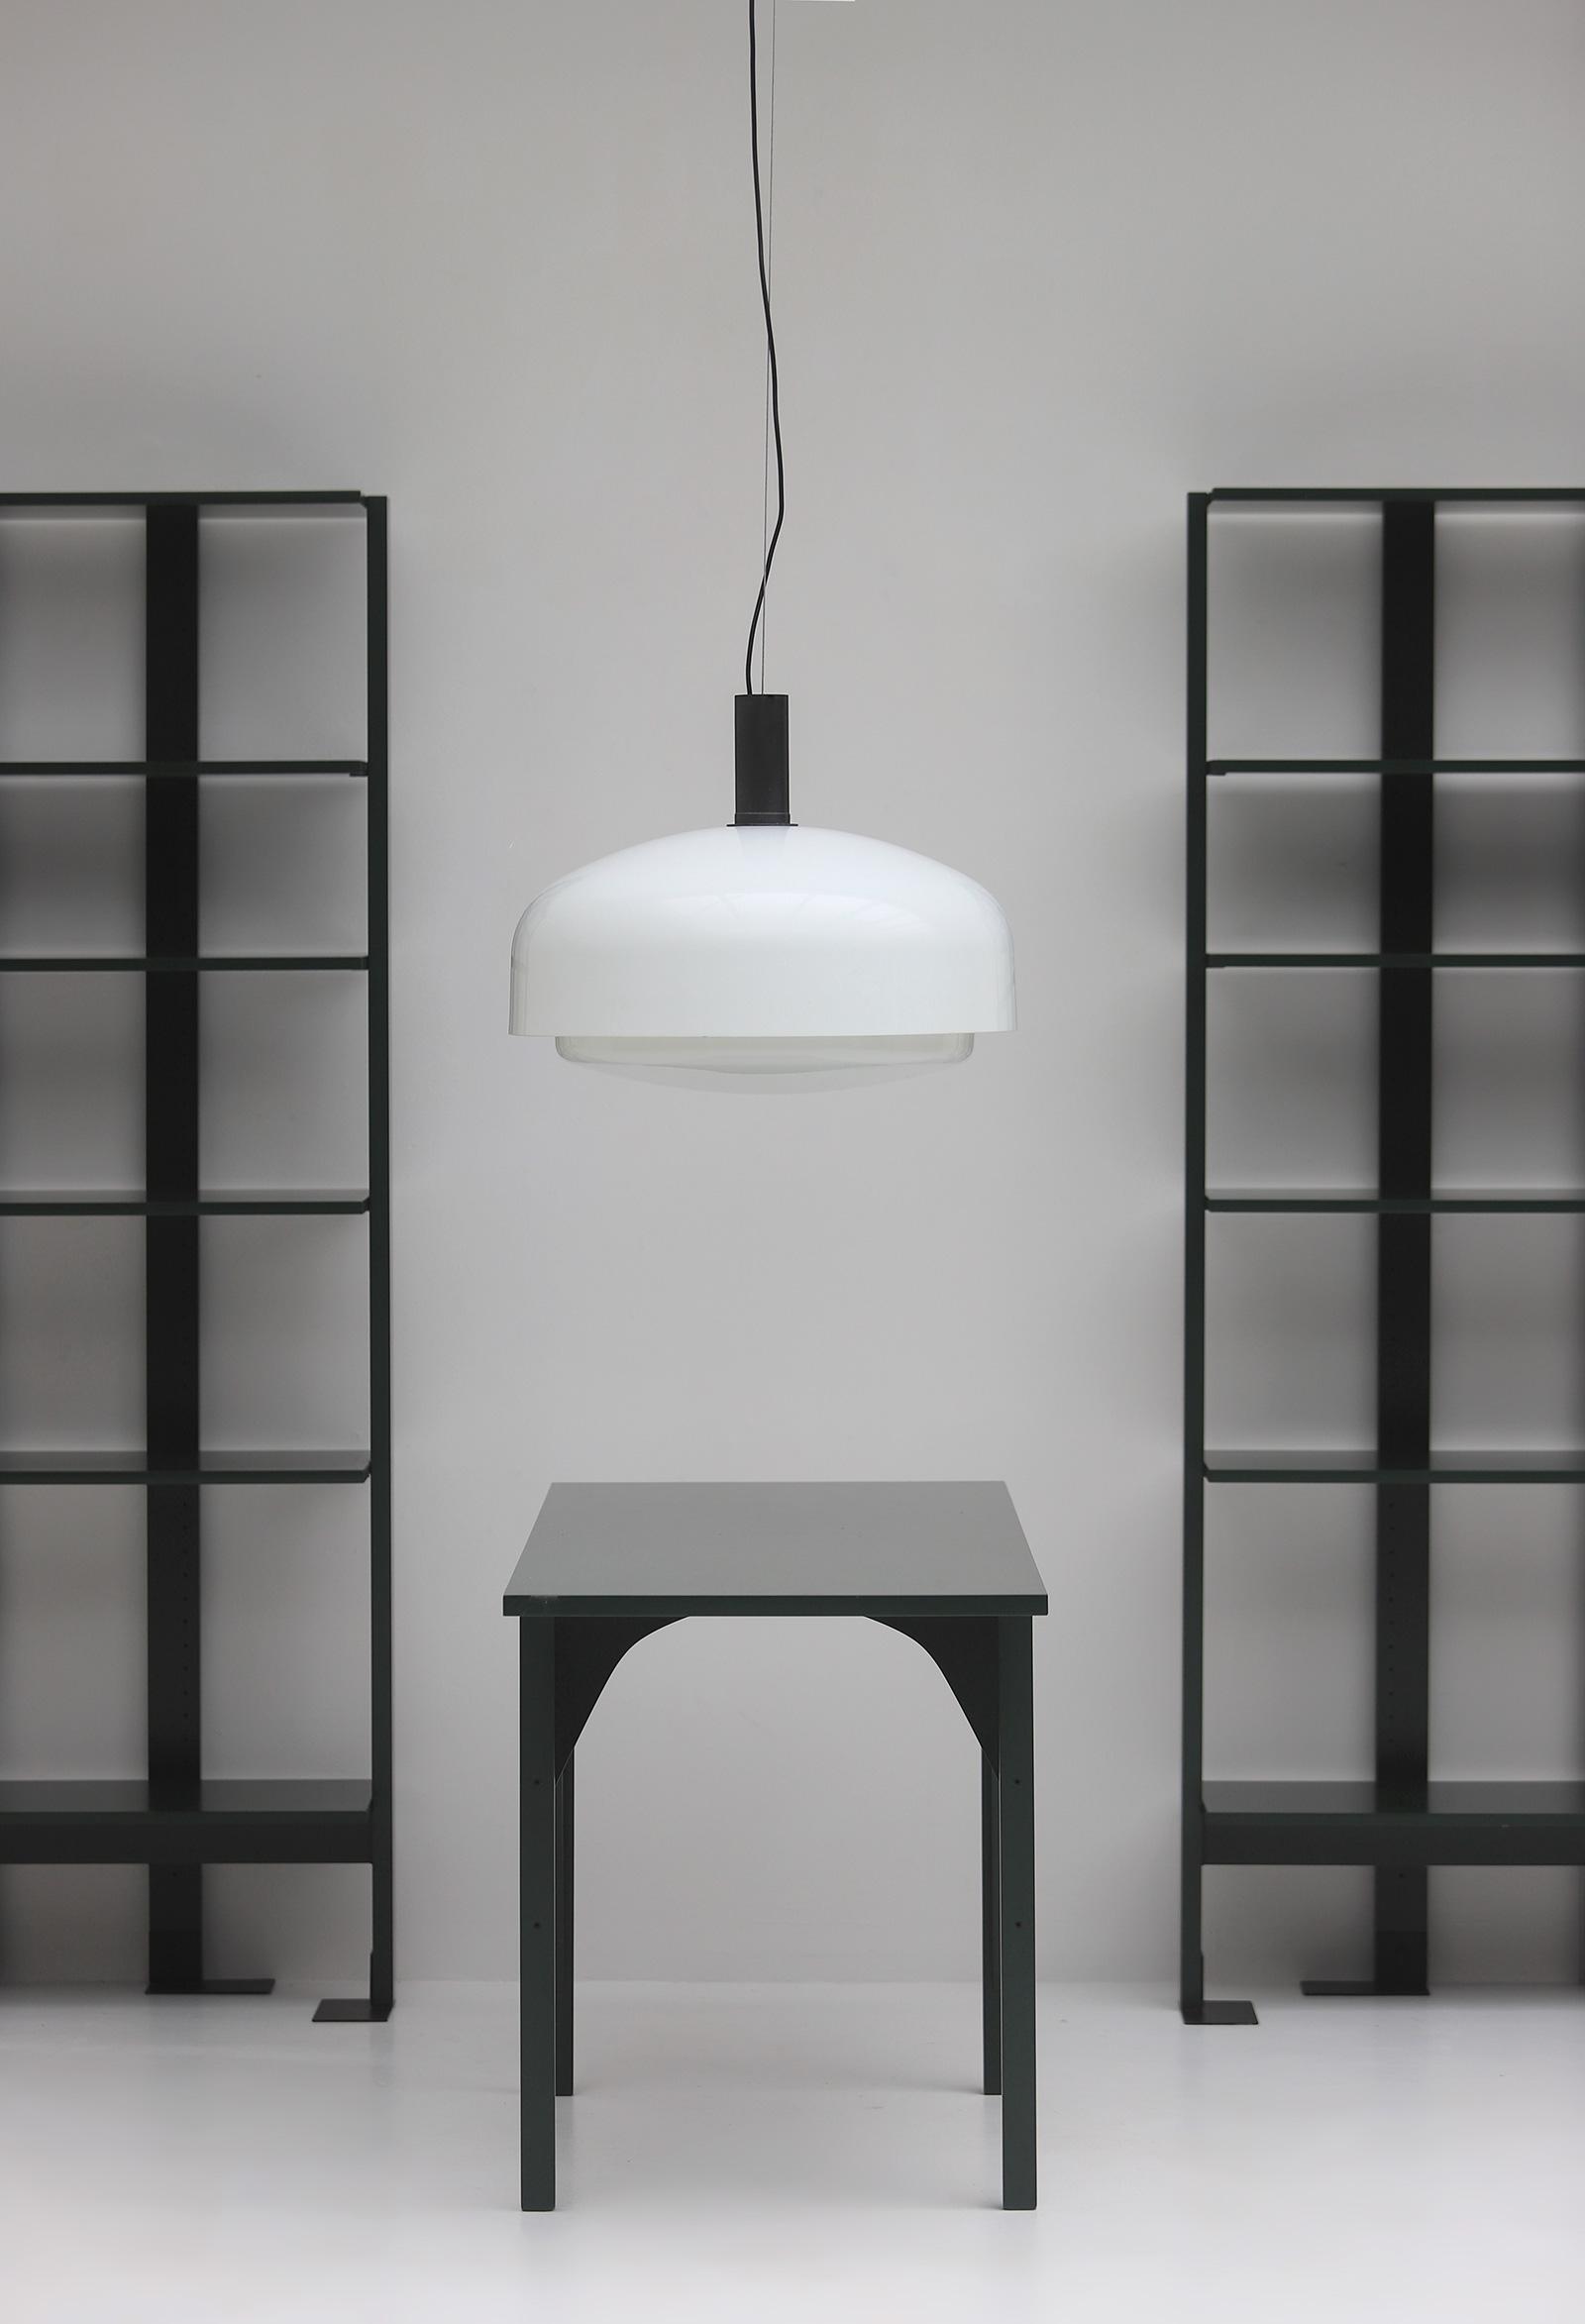 Eugenio Gentile Kartell kd62 Pendant Lamp image 1